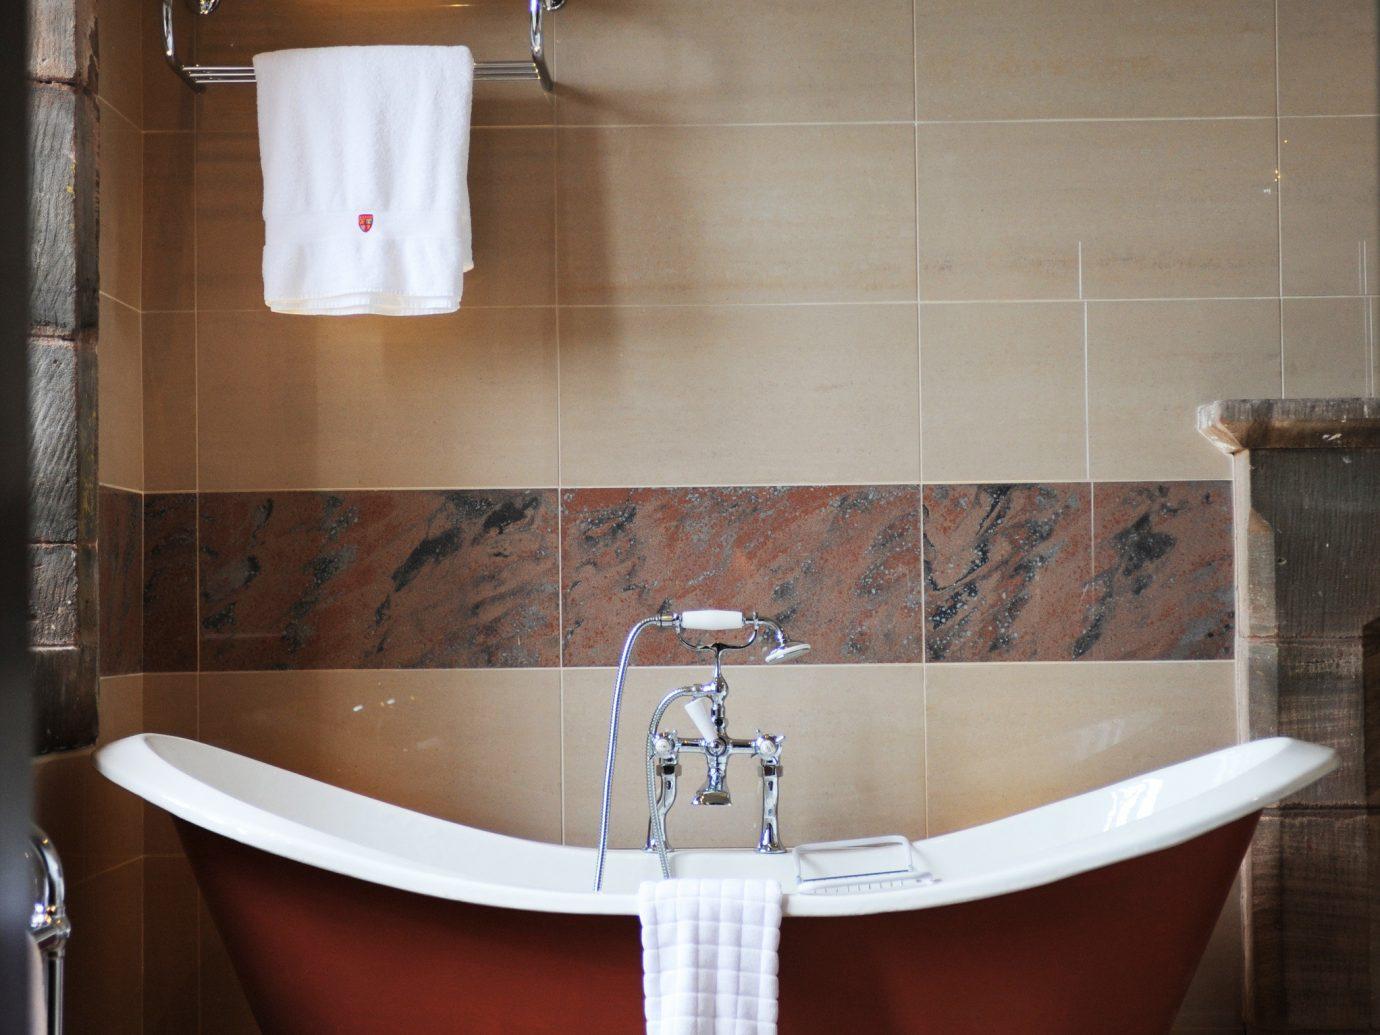 Hotels indoor wall bathroom floor room bathtub plumbing fixture flooring interior design tile tub Design sink toilet Bath tiled